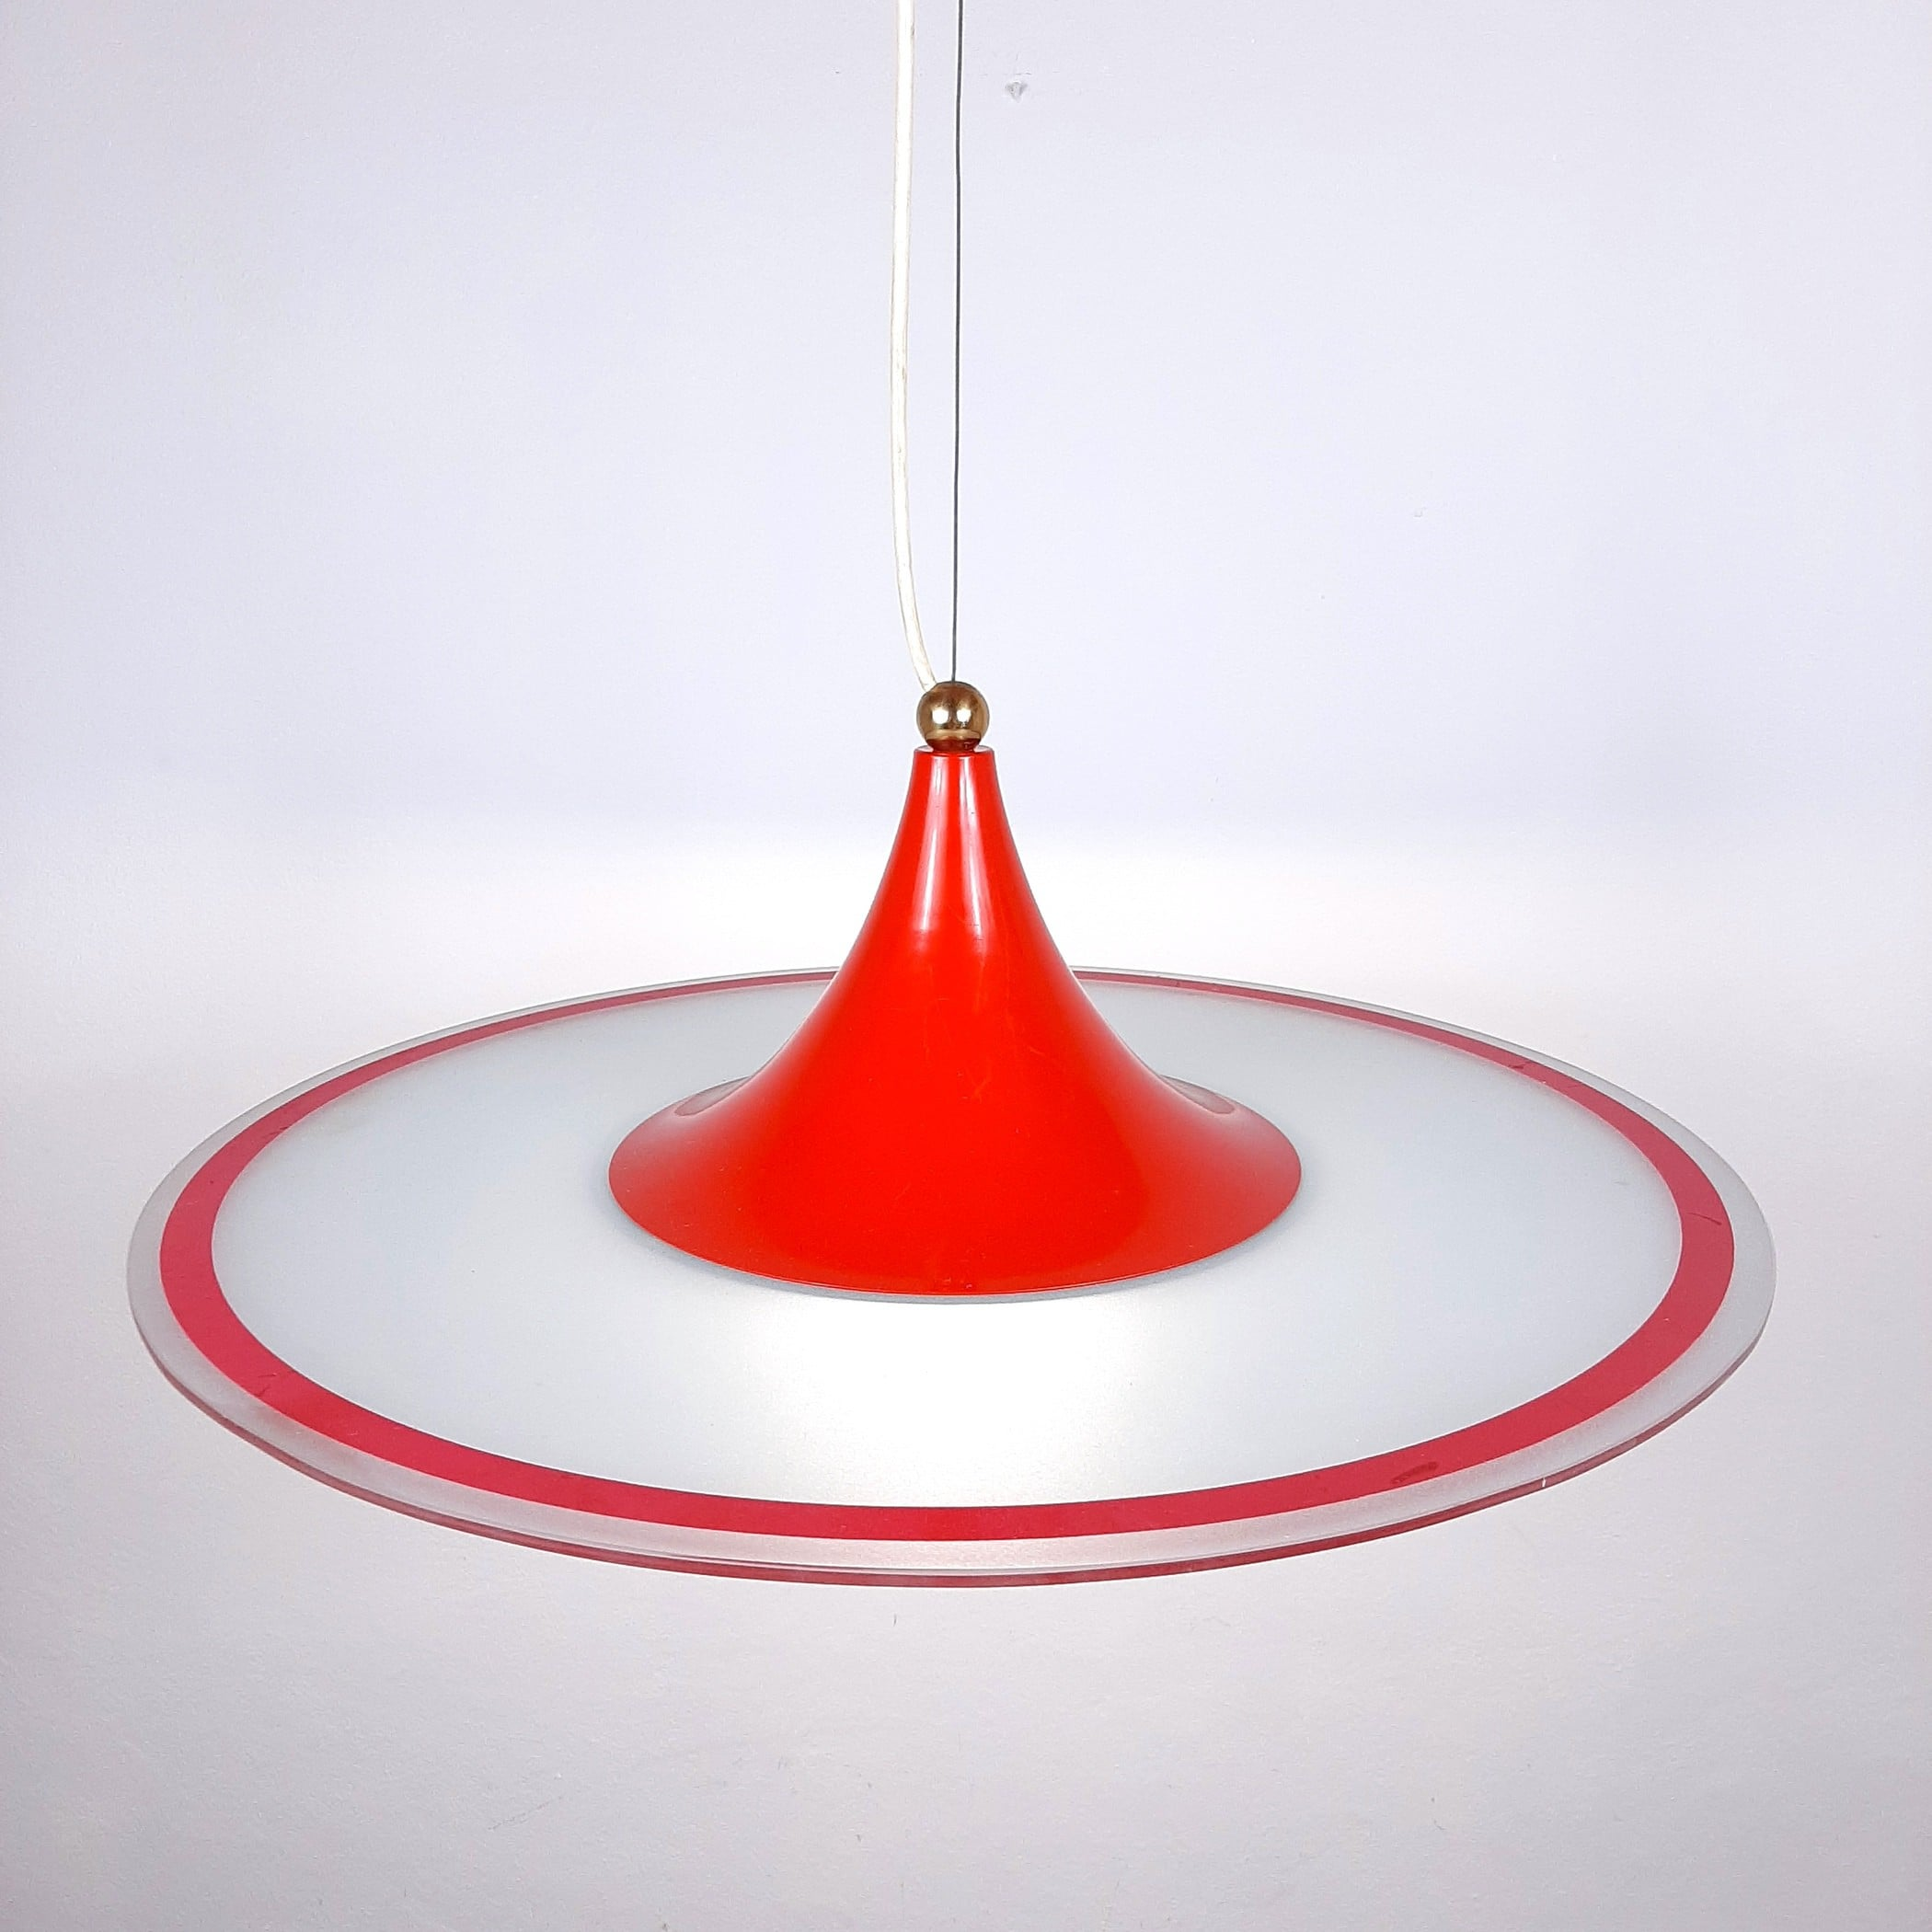 Mid-century pendant lamp Italy 60s Red retro chandelier space age atomic vintage lighting